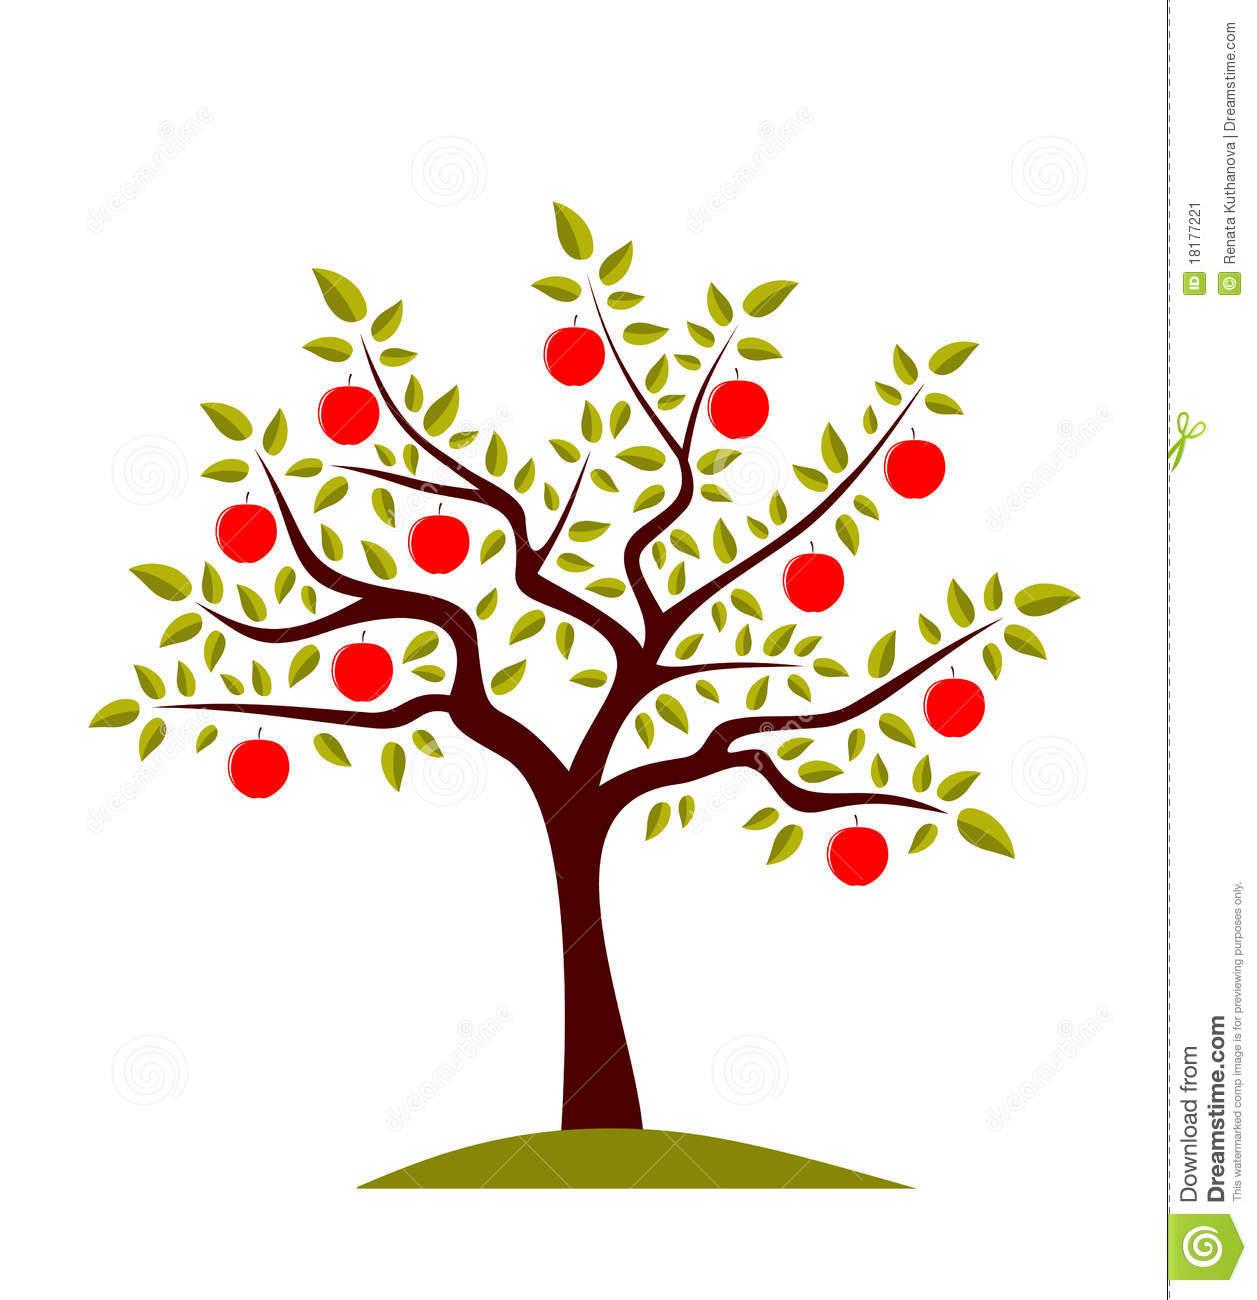 Stockbild bild. Clipart apfelbaum kostenlos